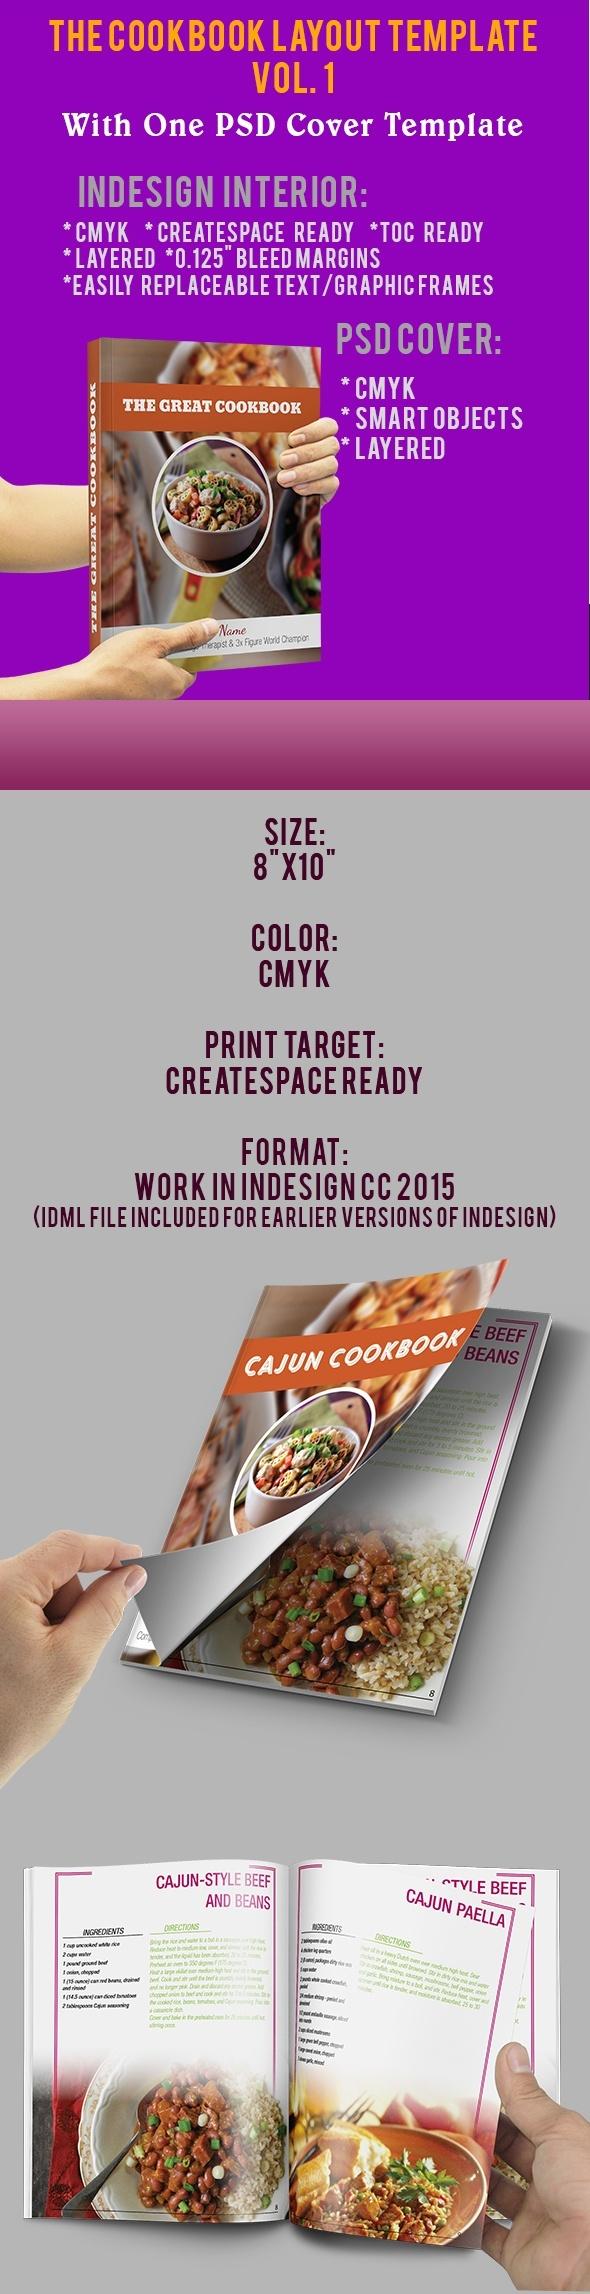 InDesign Cookbook Layout Template Vol_1 | Raingamdigitalproducts ...